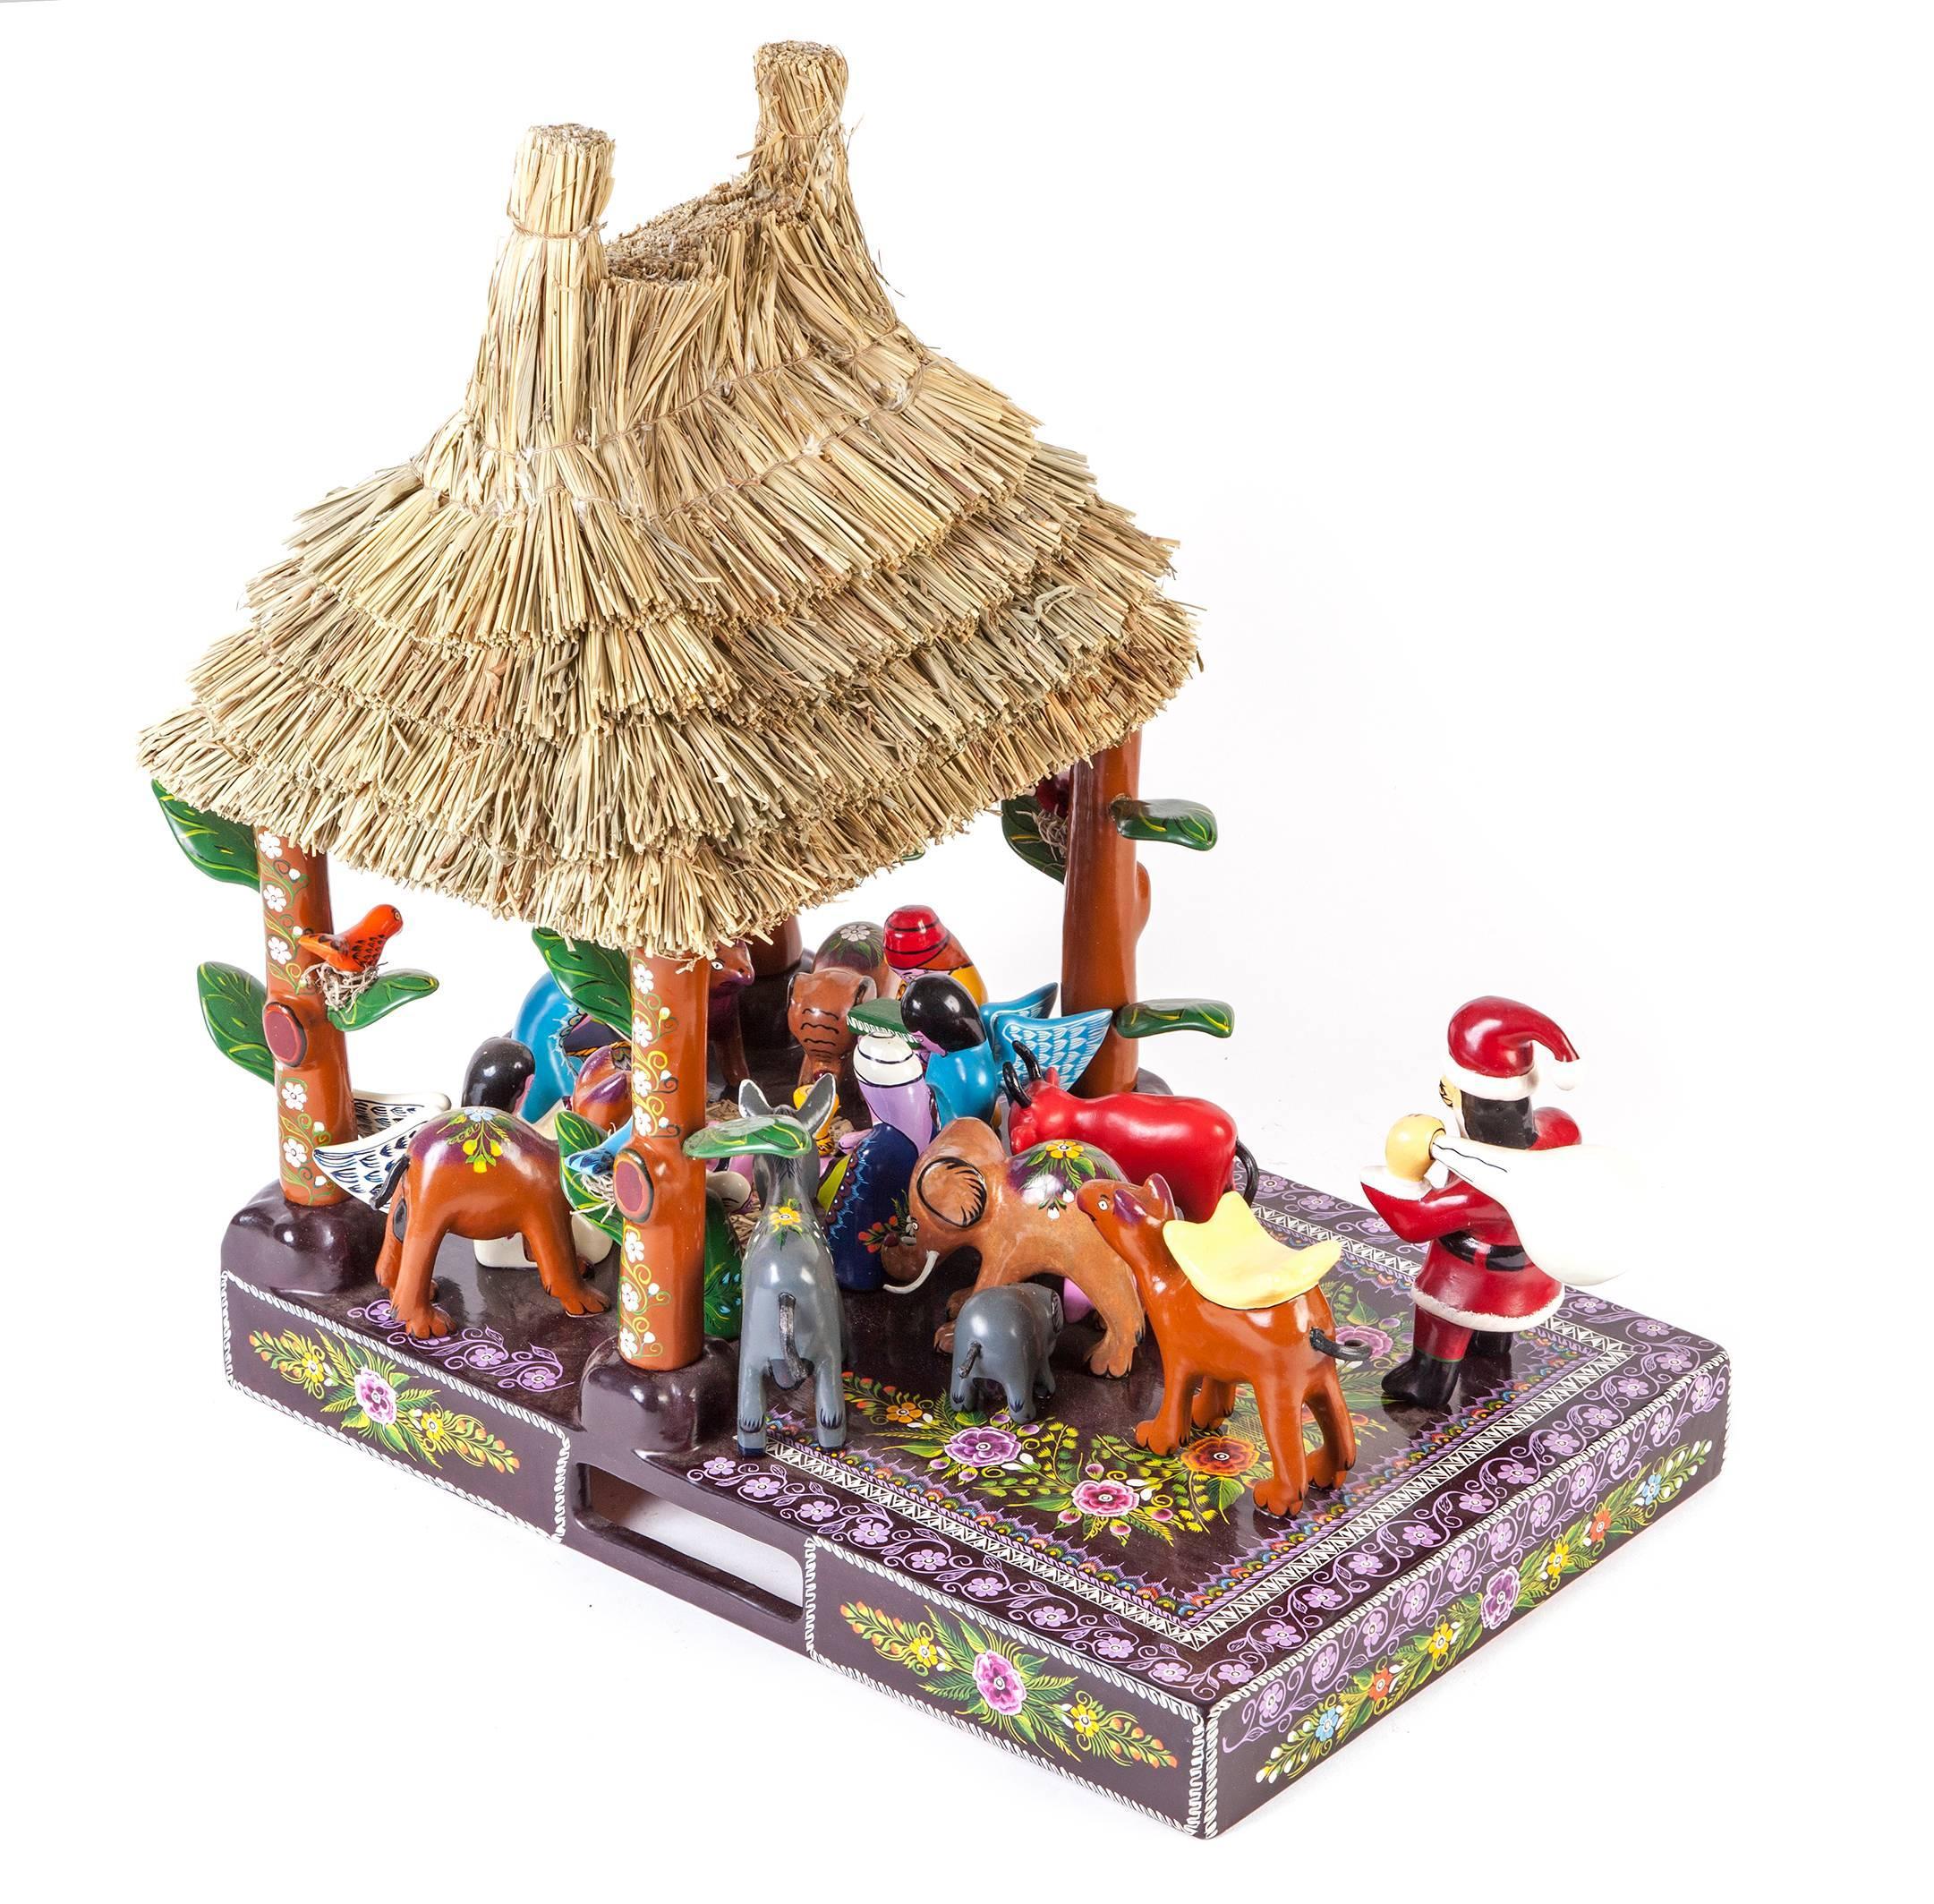 16'' Santa Claus Nacimiento / Wood carving Lacquer Sculpture Mexican Folk Art